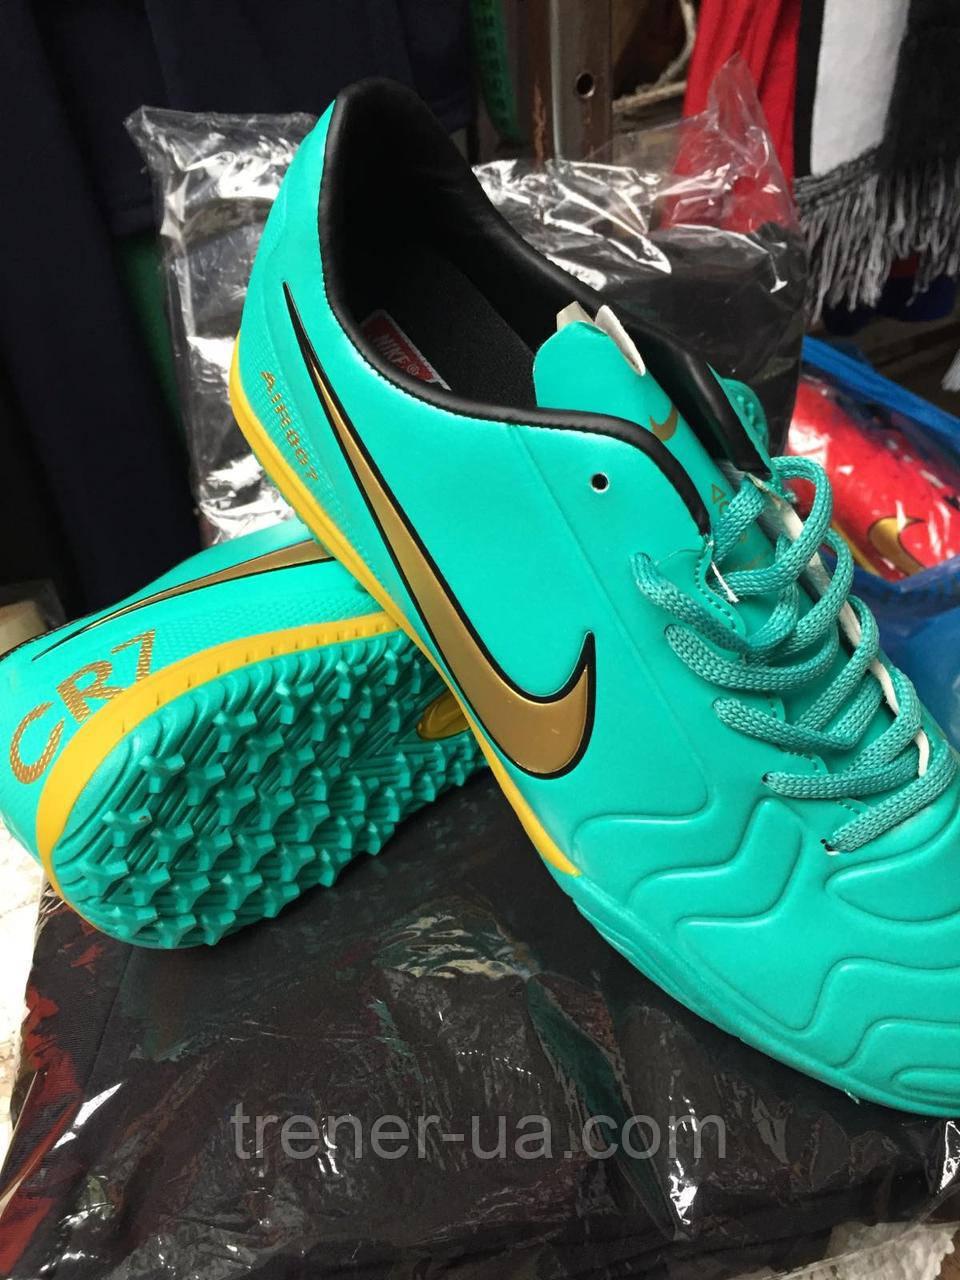 Сороконожки детские в стиле Nike CR7 бирюзовые